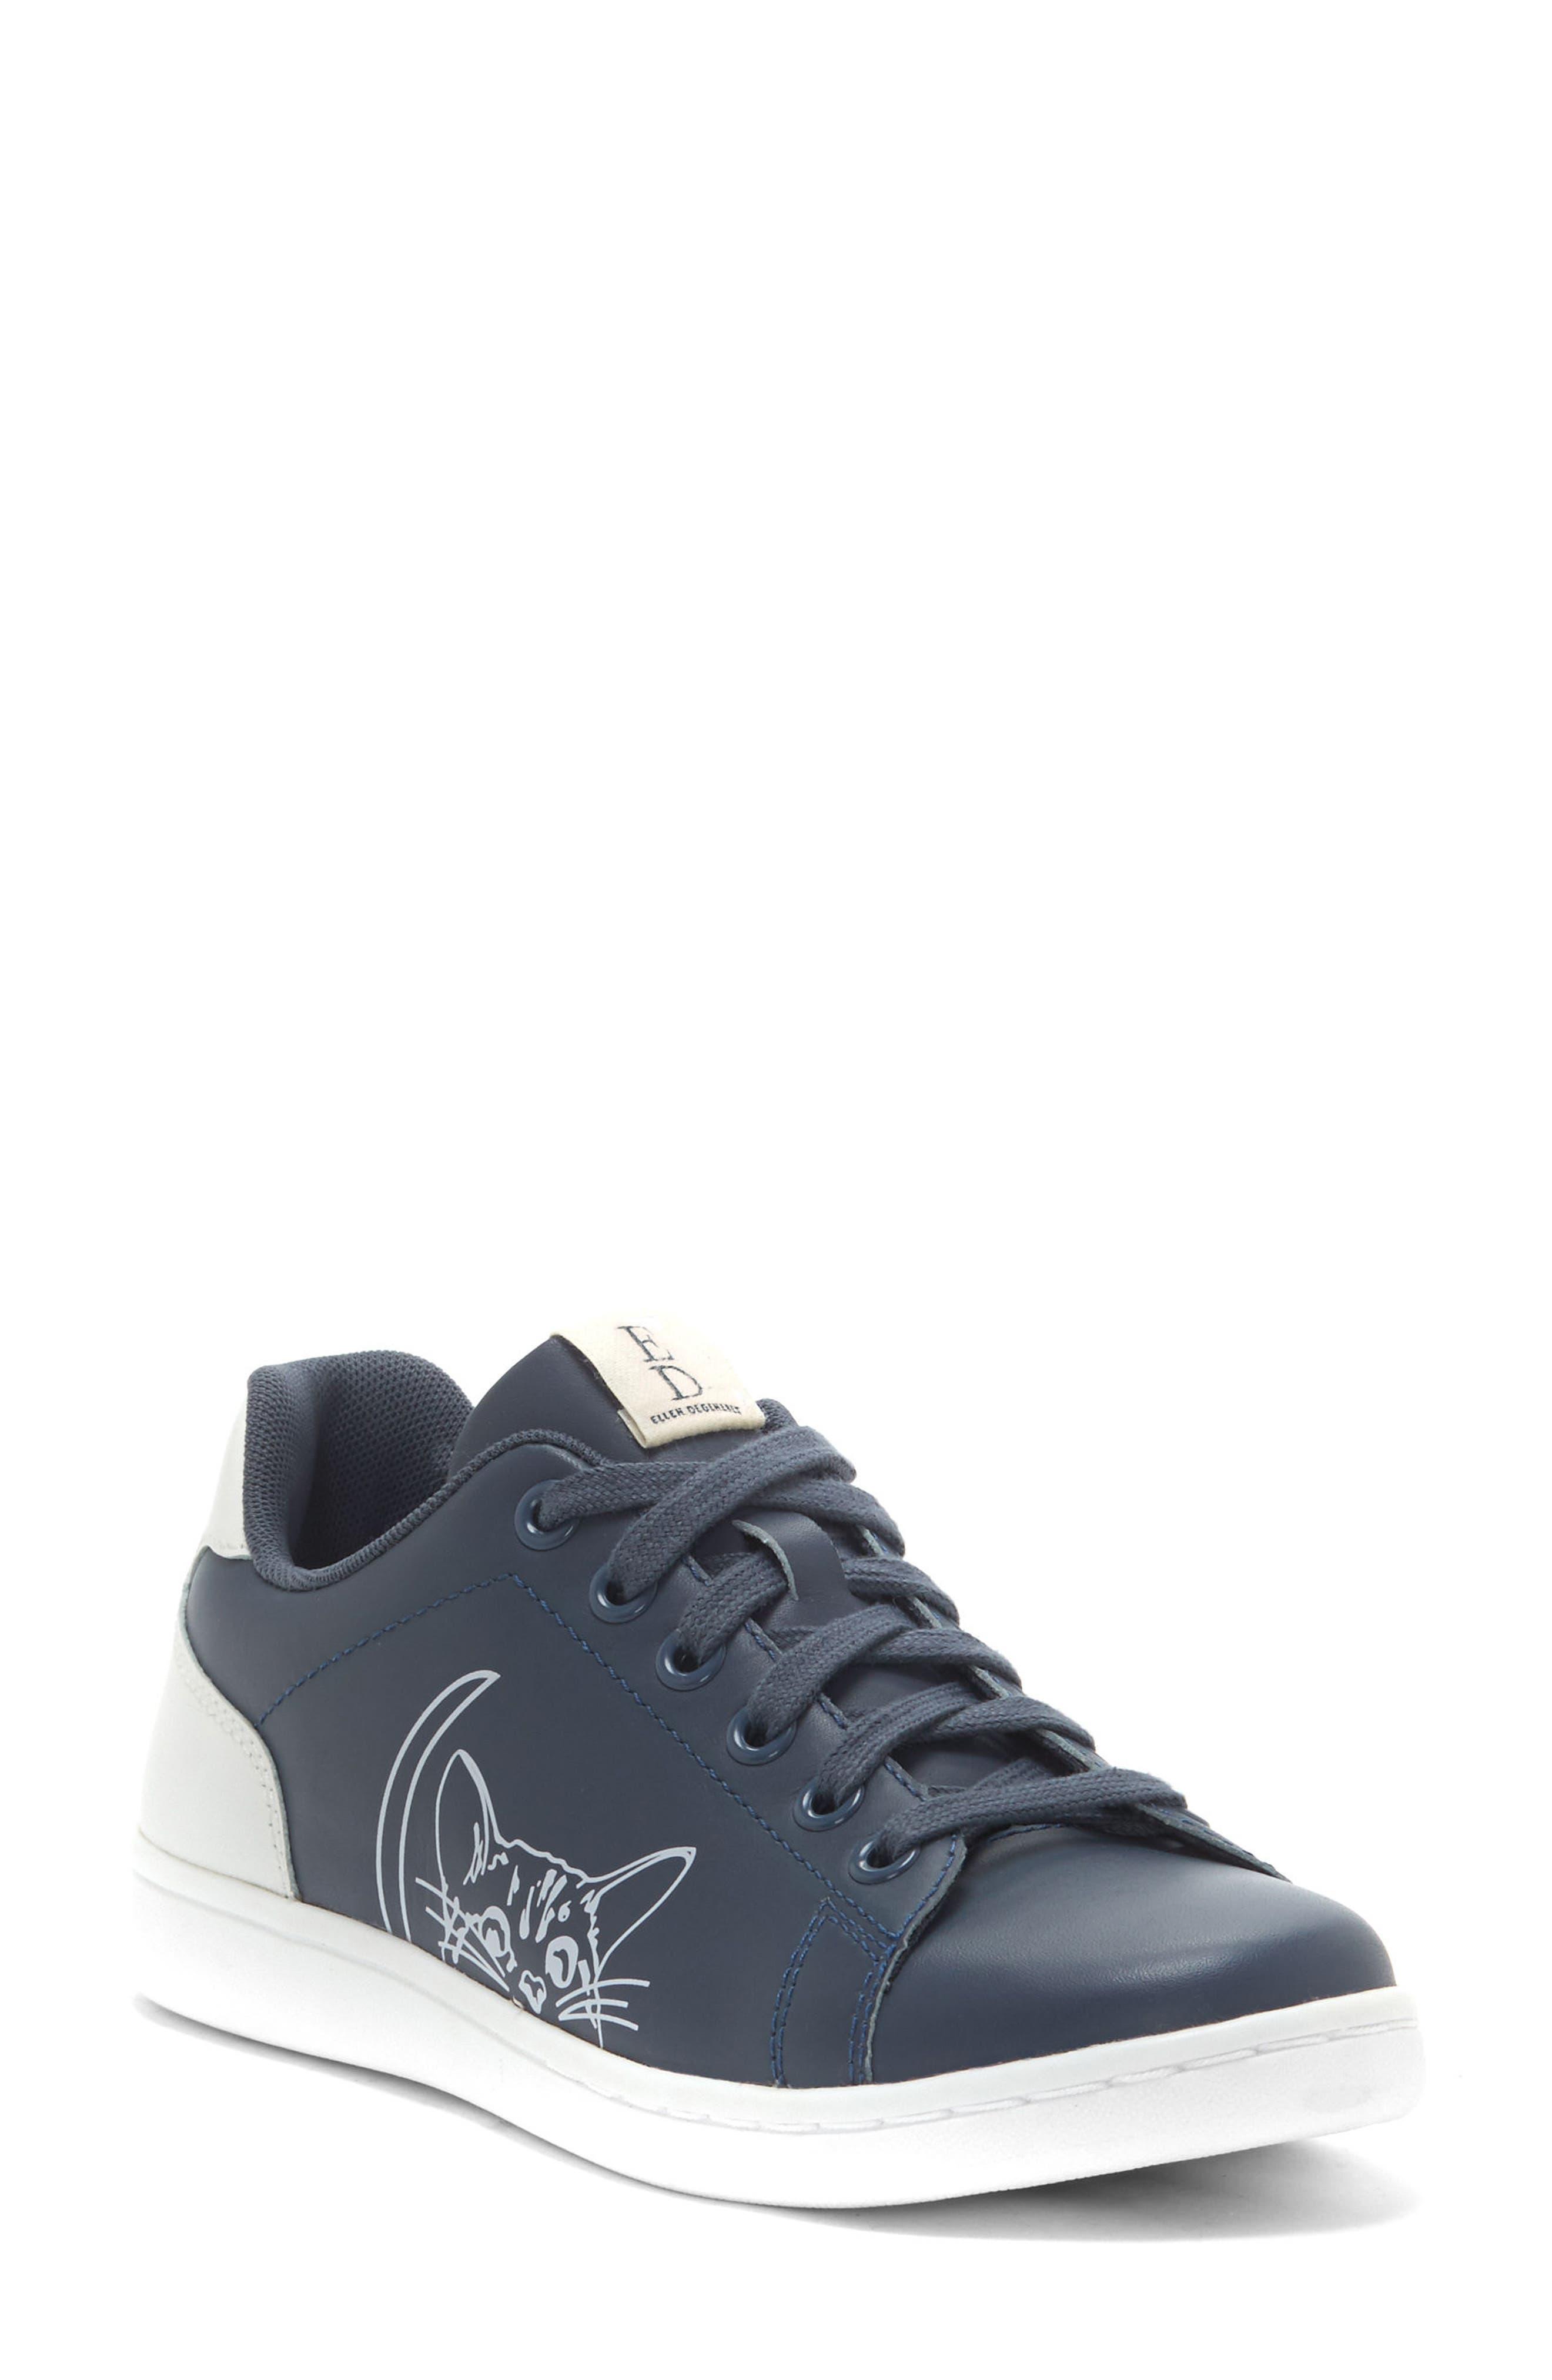 Chapanima Sneaker,                         Main,                         color,